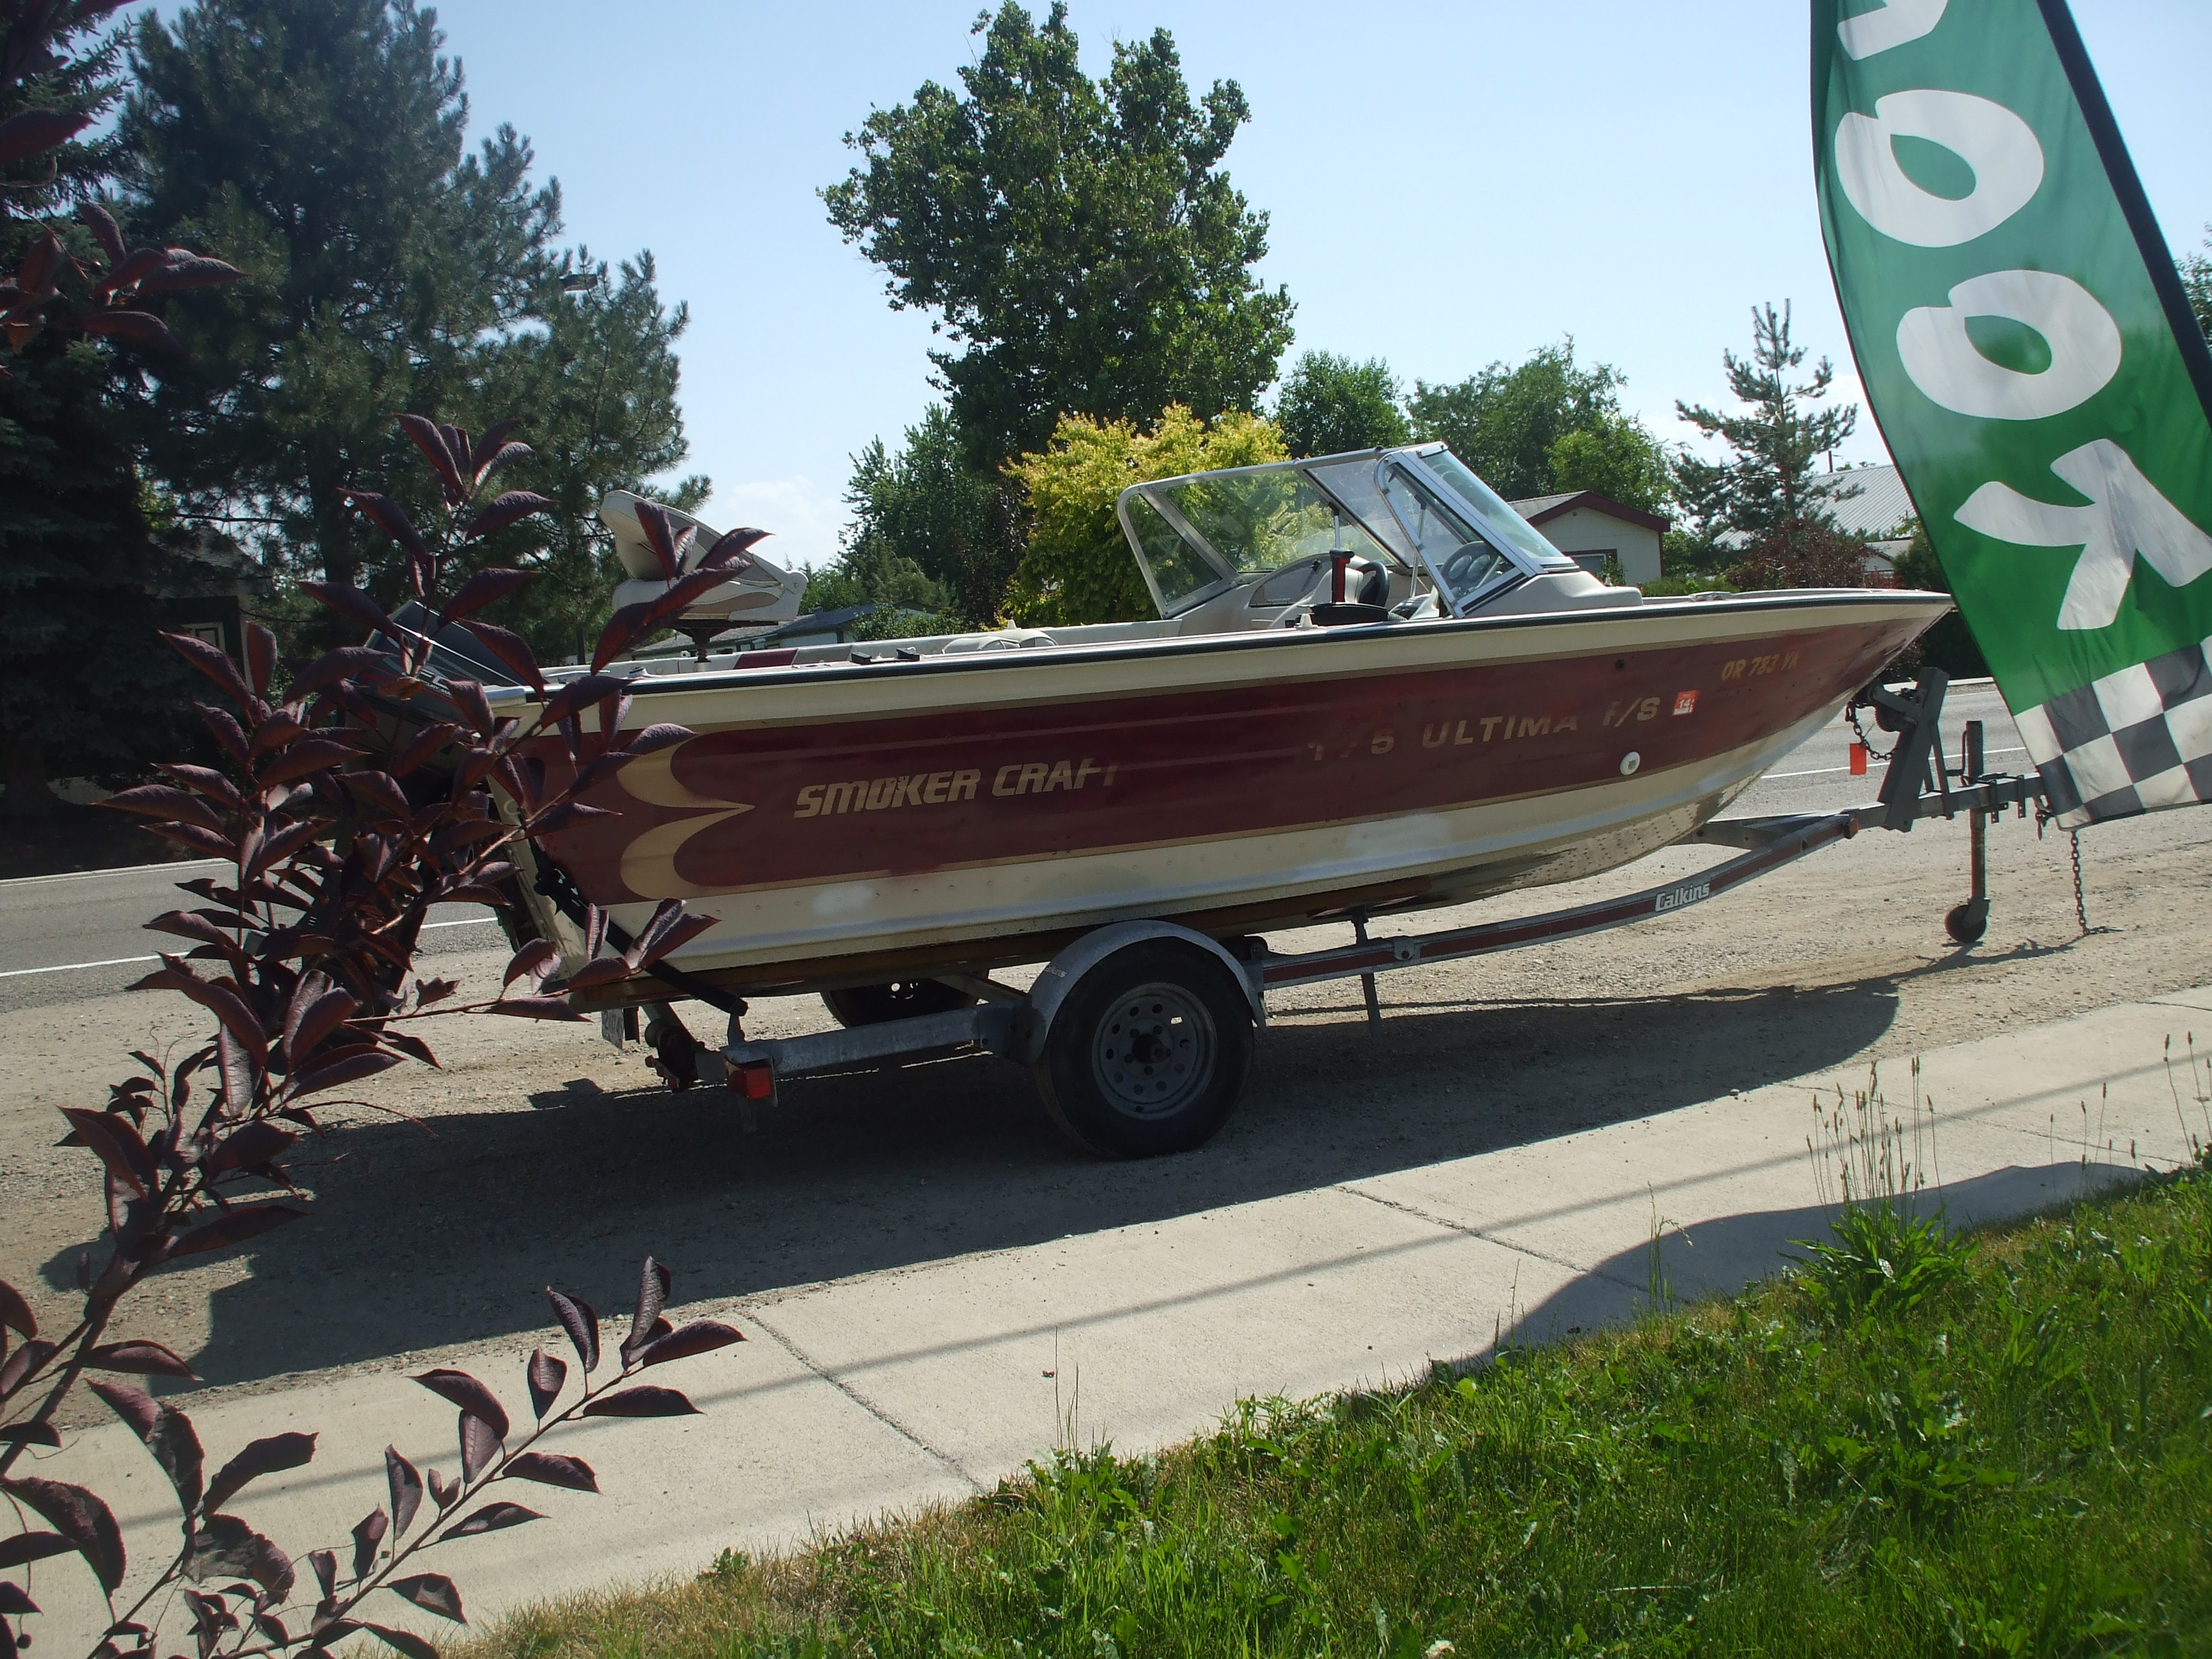 1997 Smokercraft 175 aluminum boat